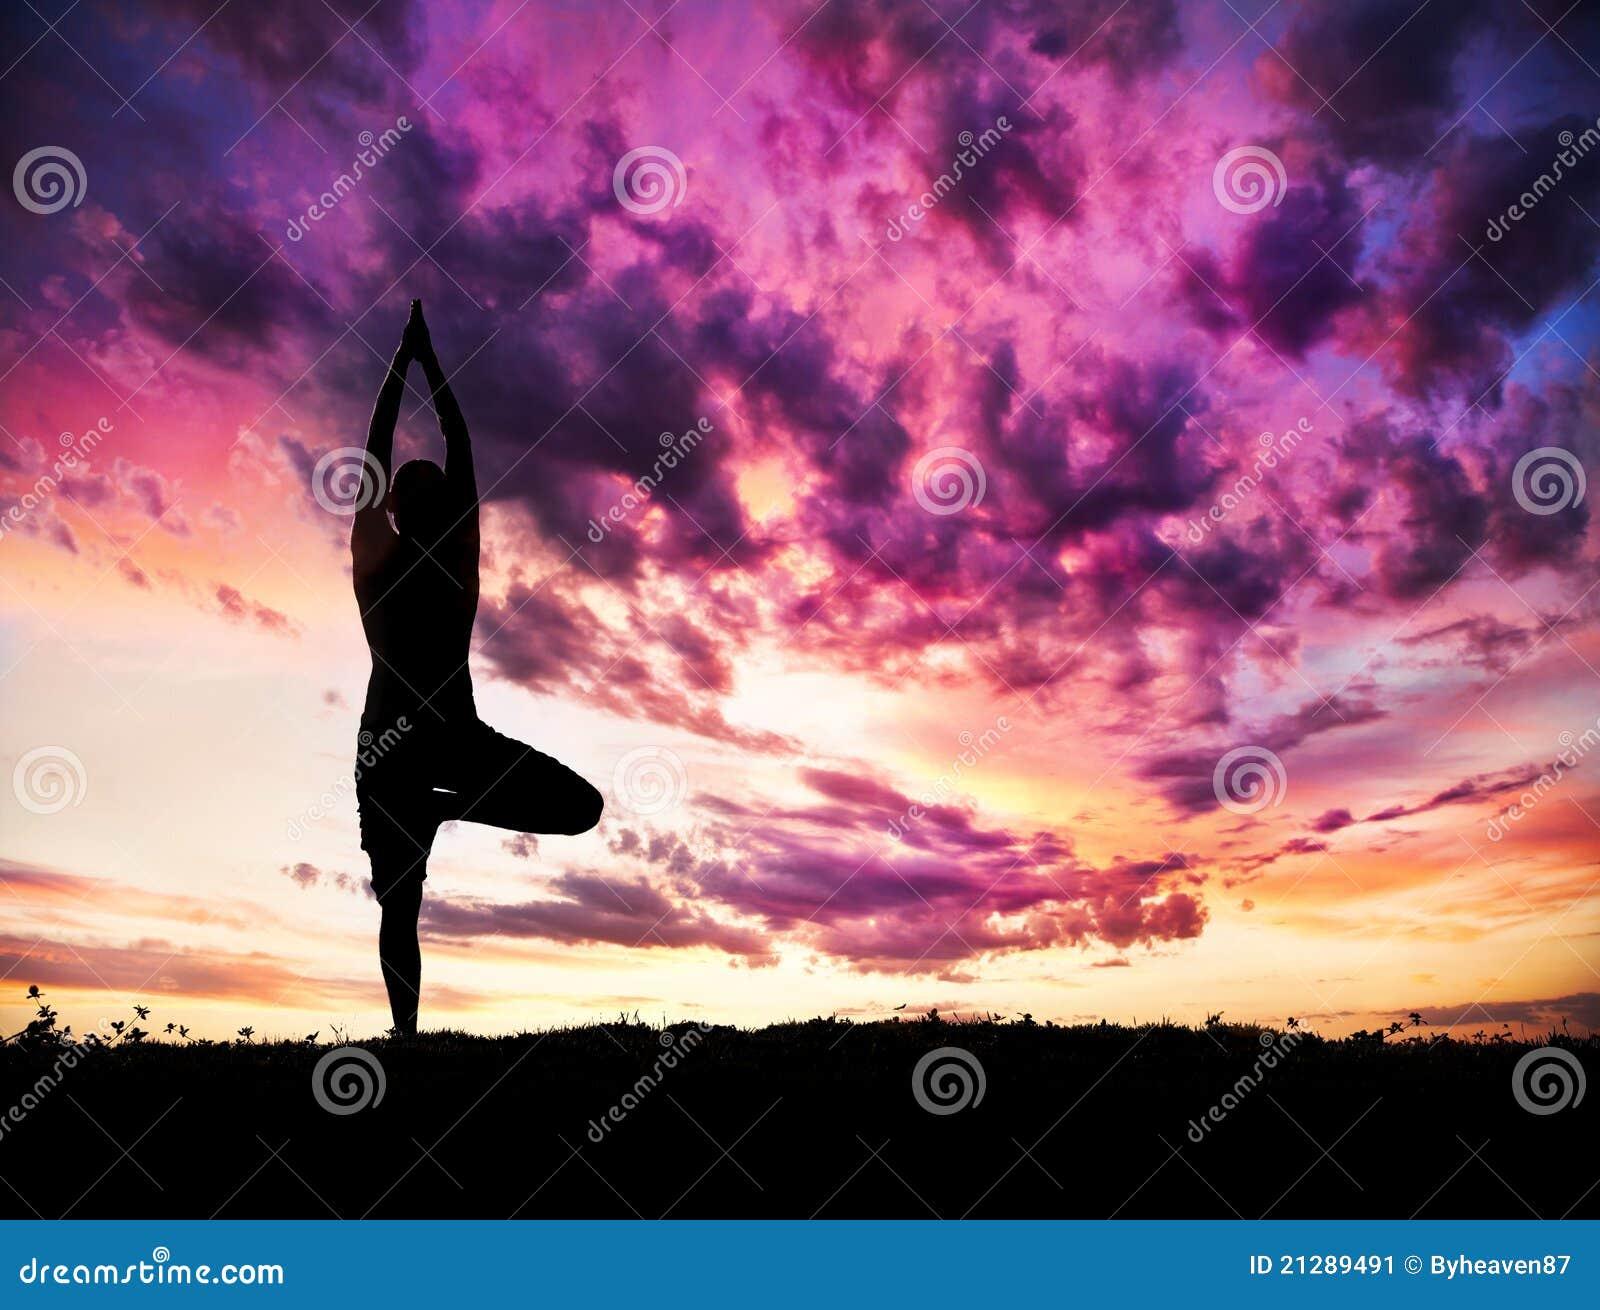 Yoga silhouette tree pose